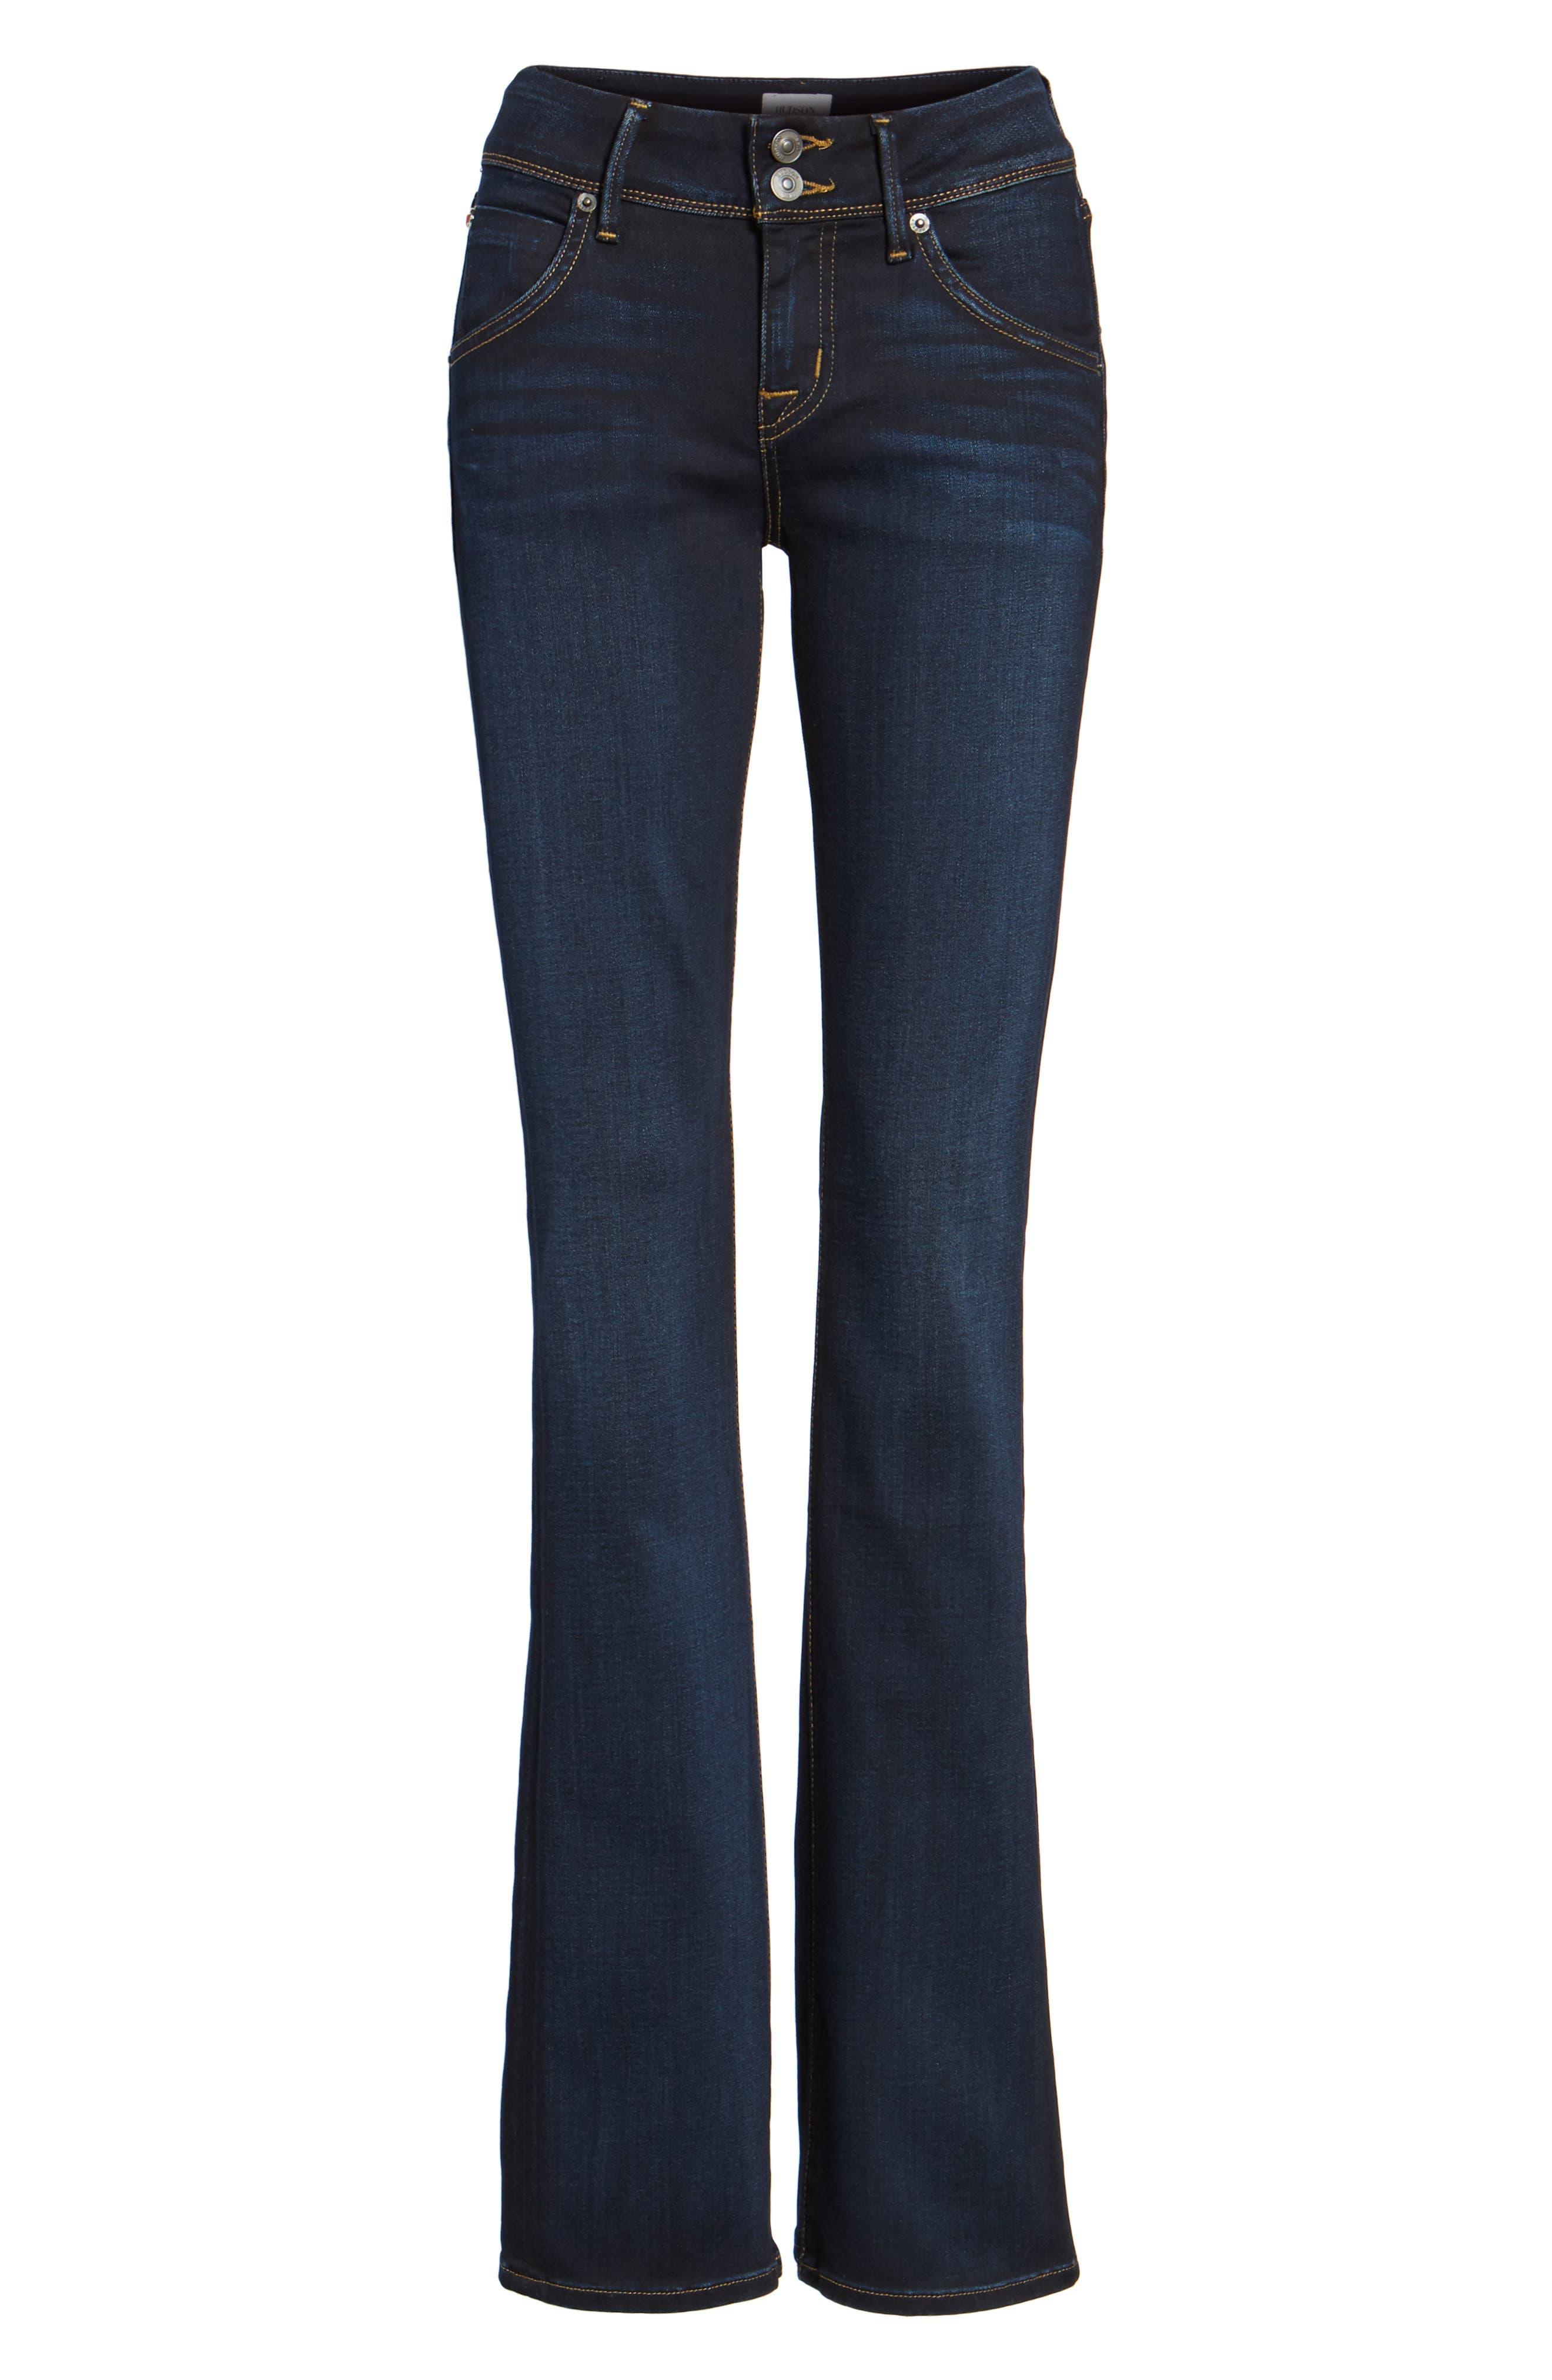 Women's Hudson Jeans 'Elysian - Beth' Baby Bootcut Jeans